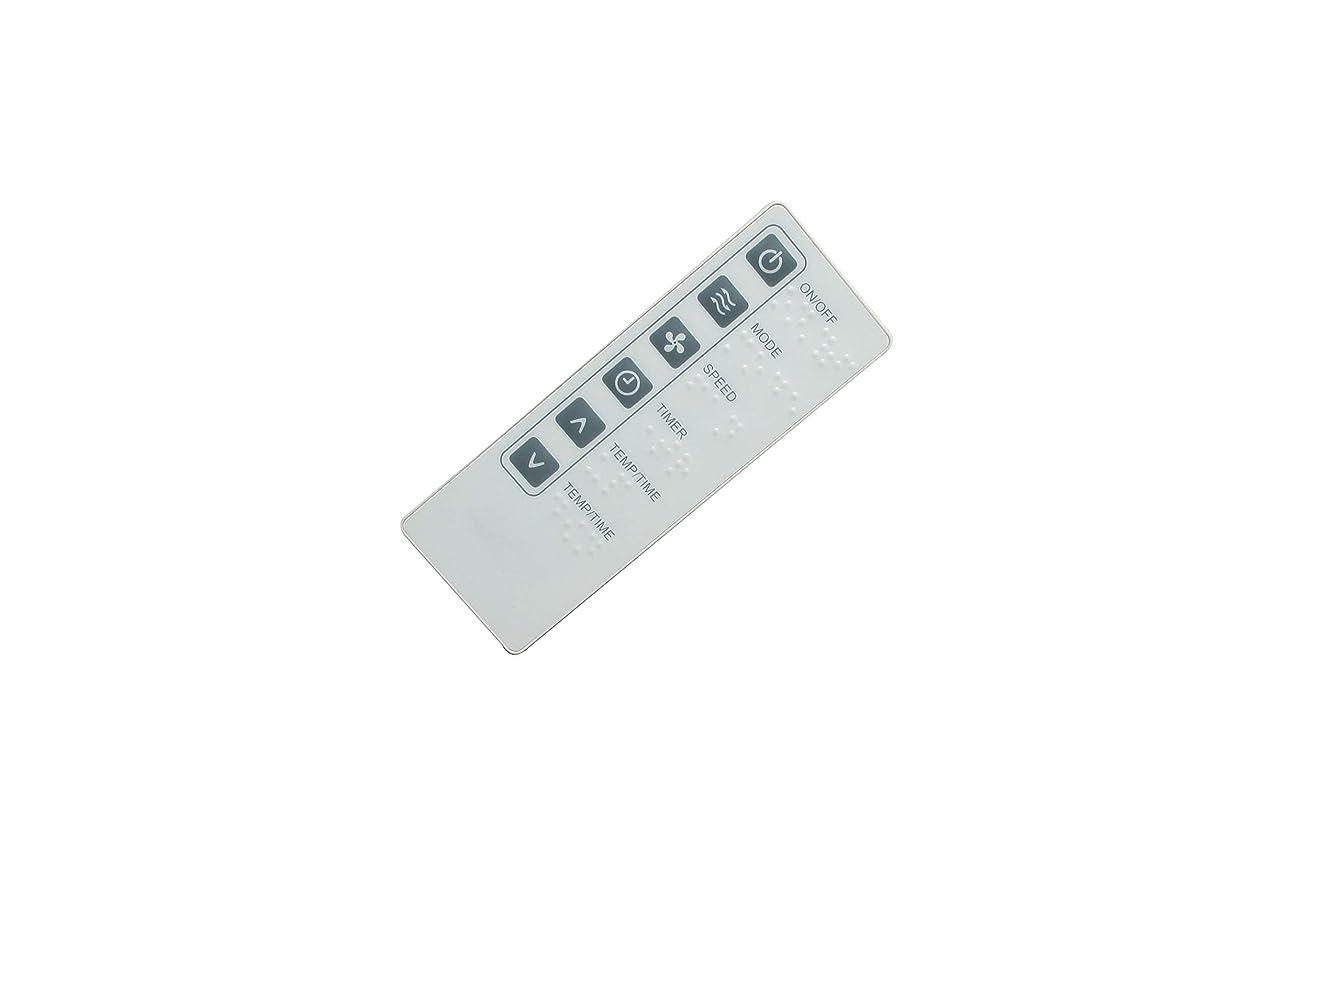 Easytry123 Remote Control for Haier ESA410JL ESA410JT HWE08XCR HWE08XCR-L HWE08XCR-LD HWE10XCR HWE10XCR-L HWE10XCR-LD HWE10XCR-T Air Conditioner